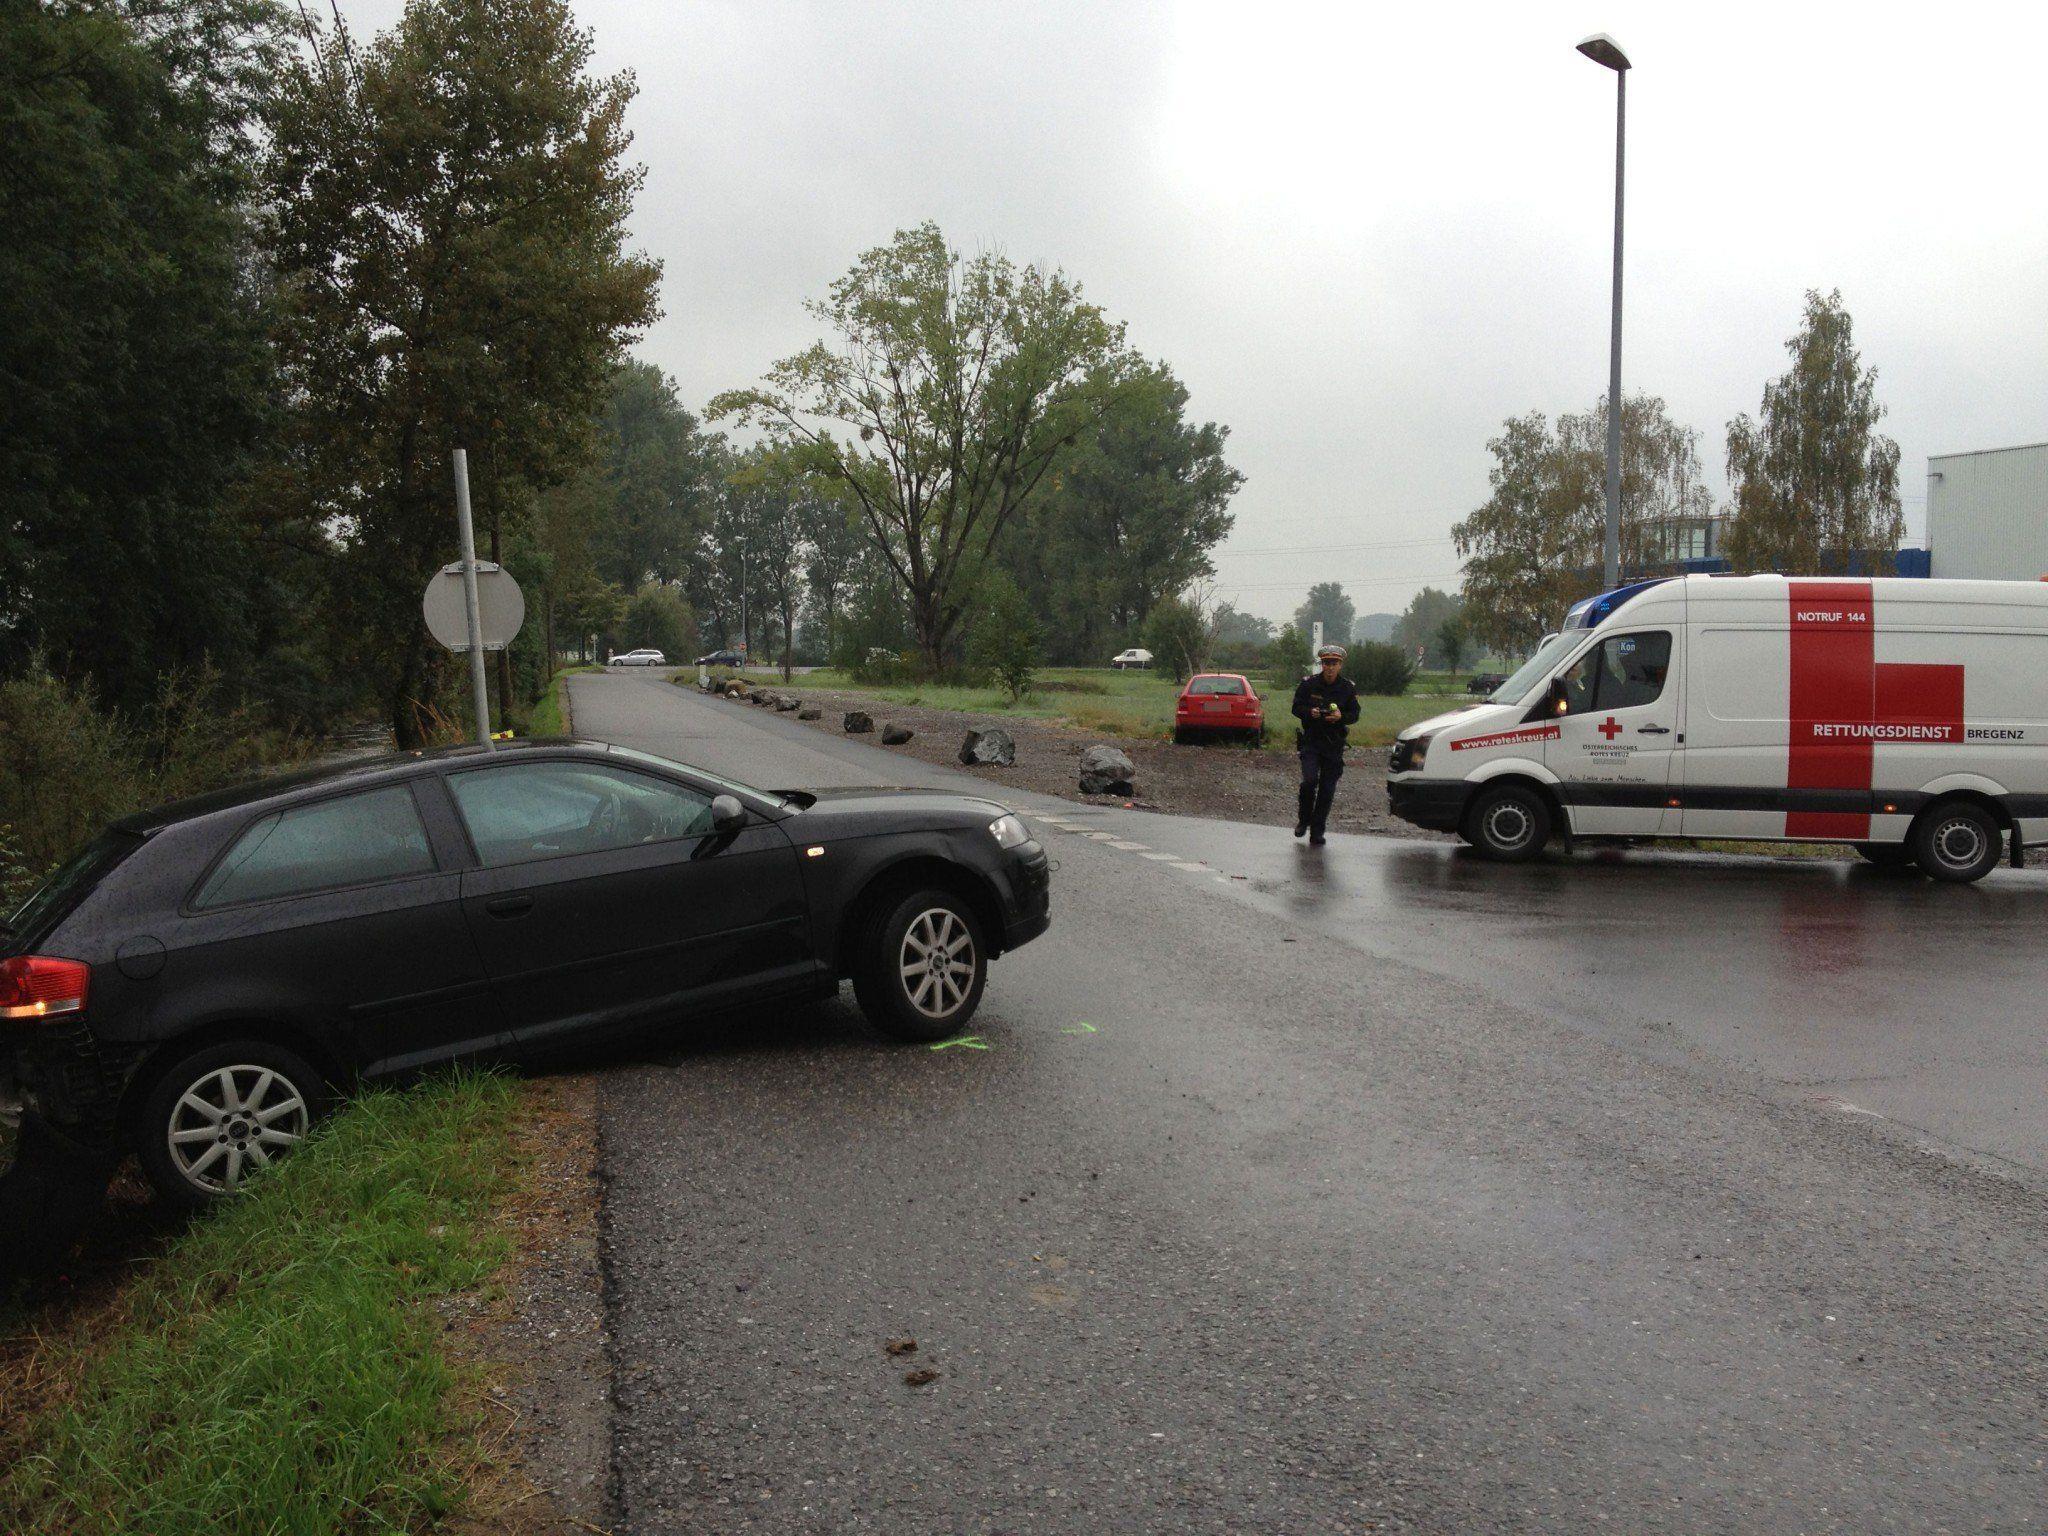 Verkehrsunfall in Wolfurt: drei Frauen leicht verletzt.